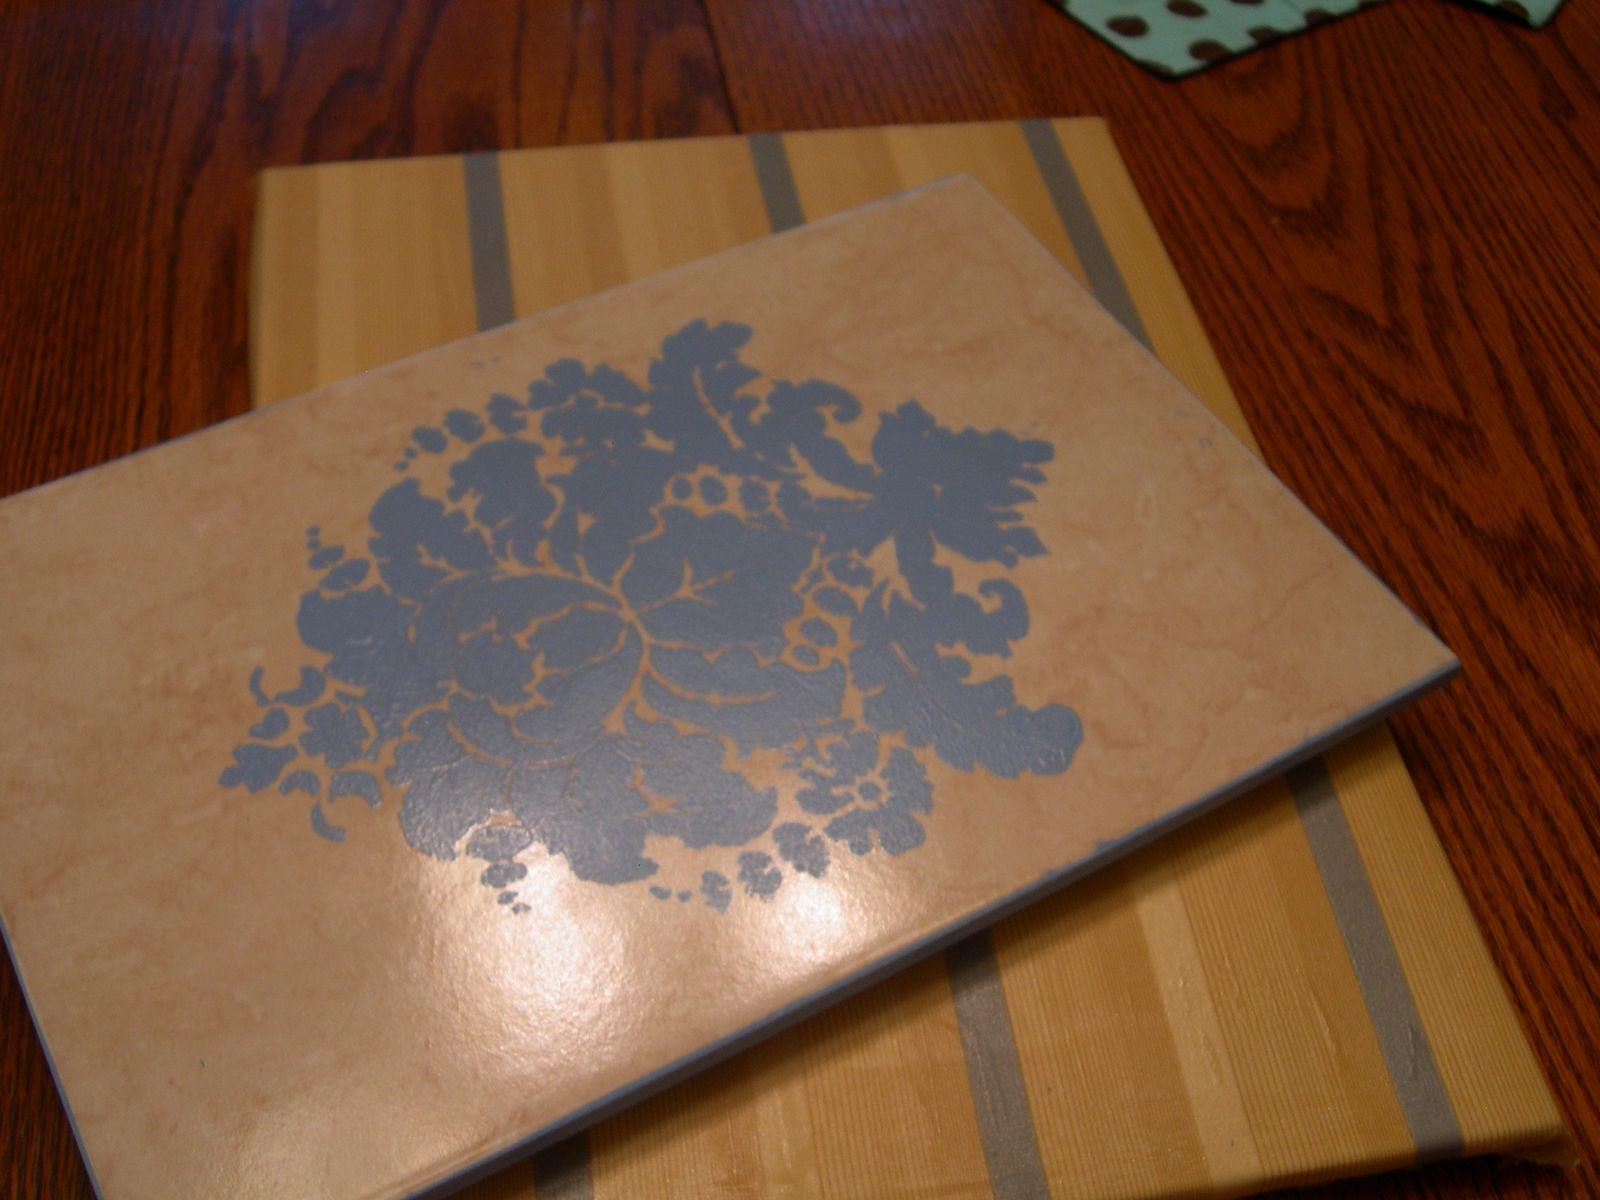 The miss adventures of susie homemaker ceramic tile trivet tutorial ceramic tile trivet tutorial dailygadgetfo Images